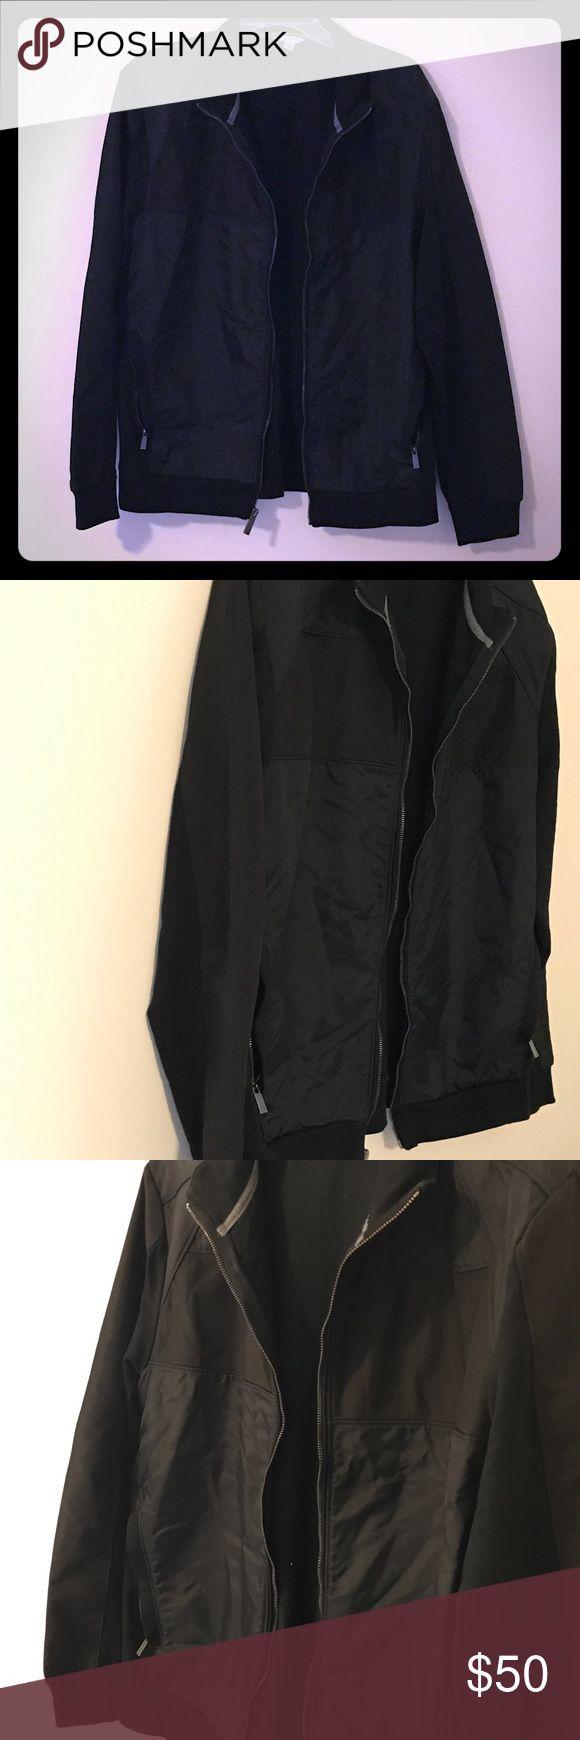 Men's Calvin Klein Jacket Size Large Men's Calvin Klein Jacket Size Large Calvin Klein Jackets & Coats